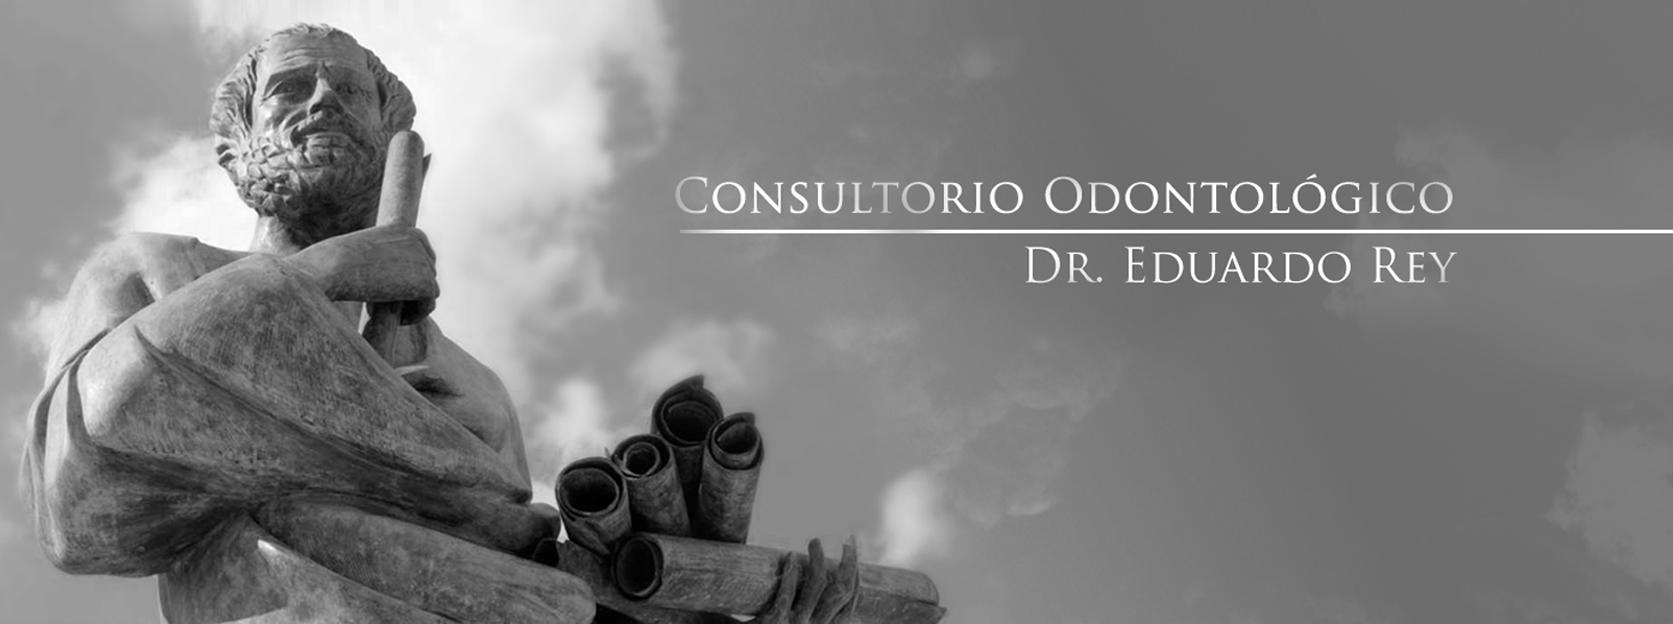 Consultorio Doctor Eduardo Rey